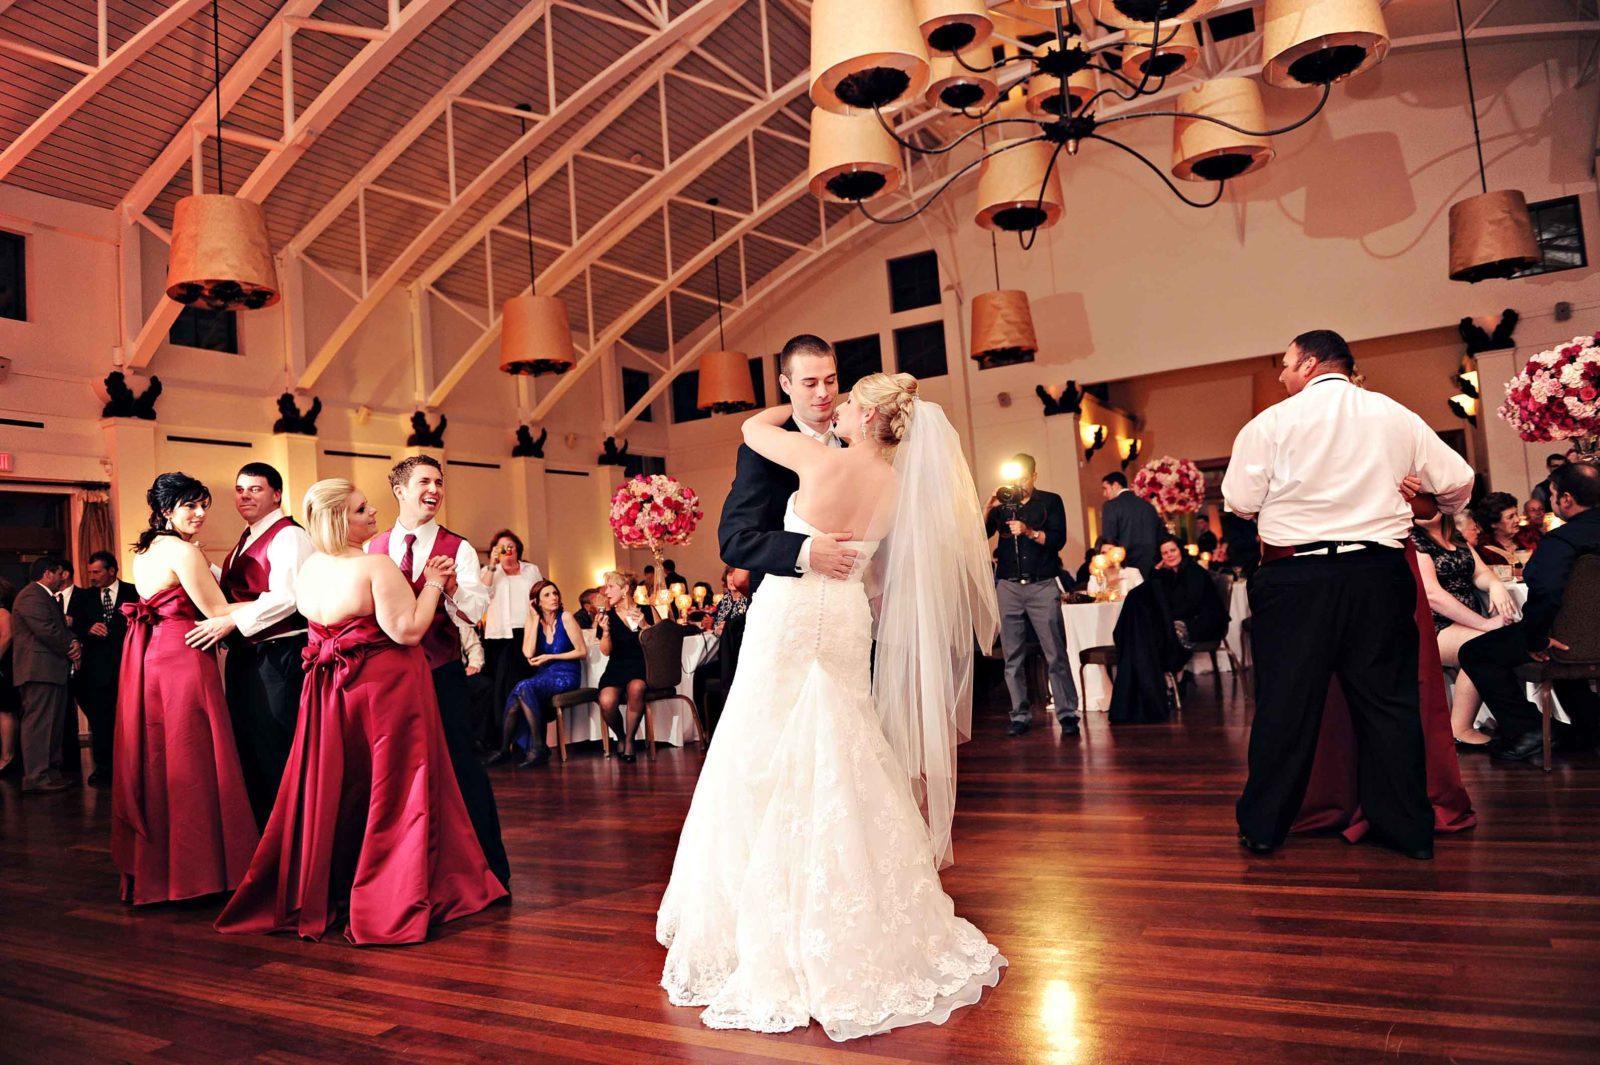 Bridal Party dance at the Audubon Tea Room. Photo: Studio Tran